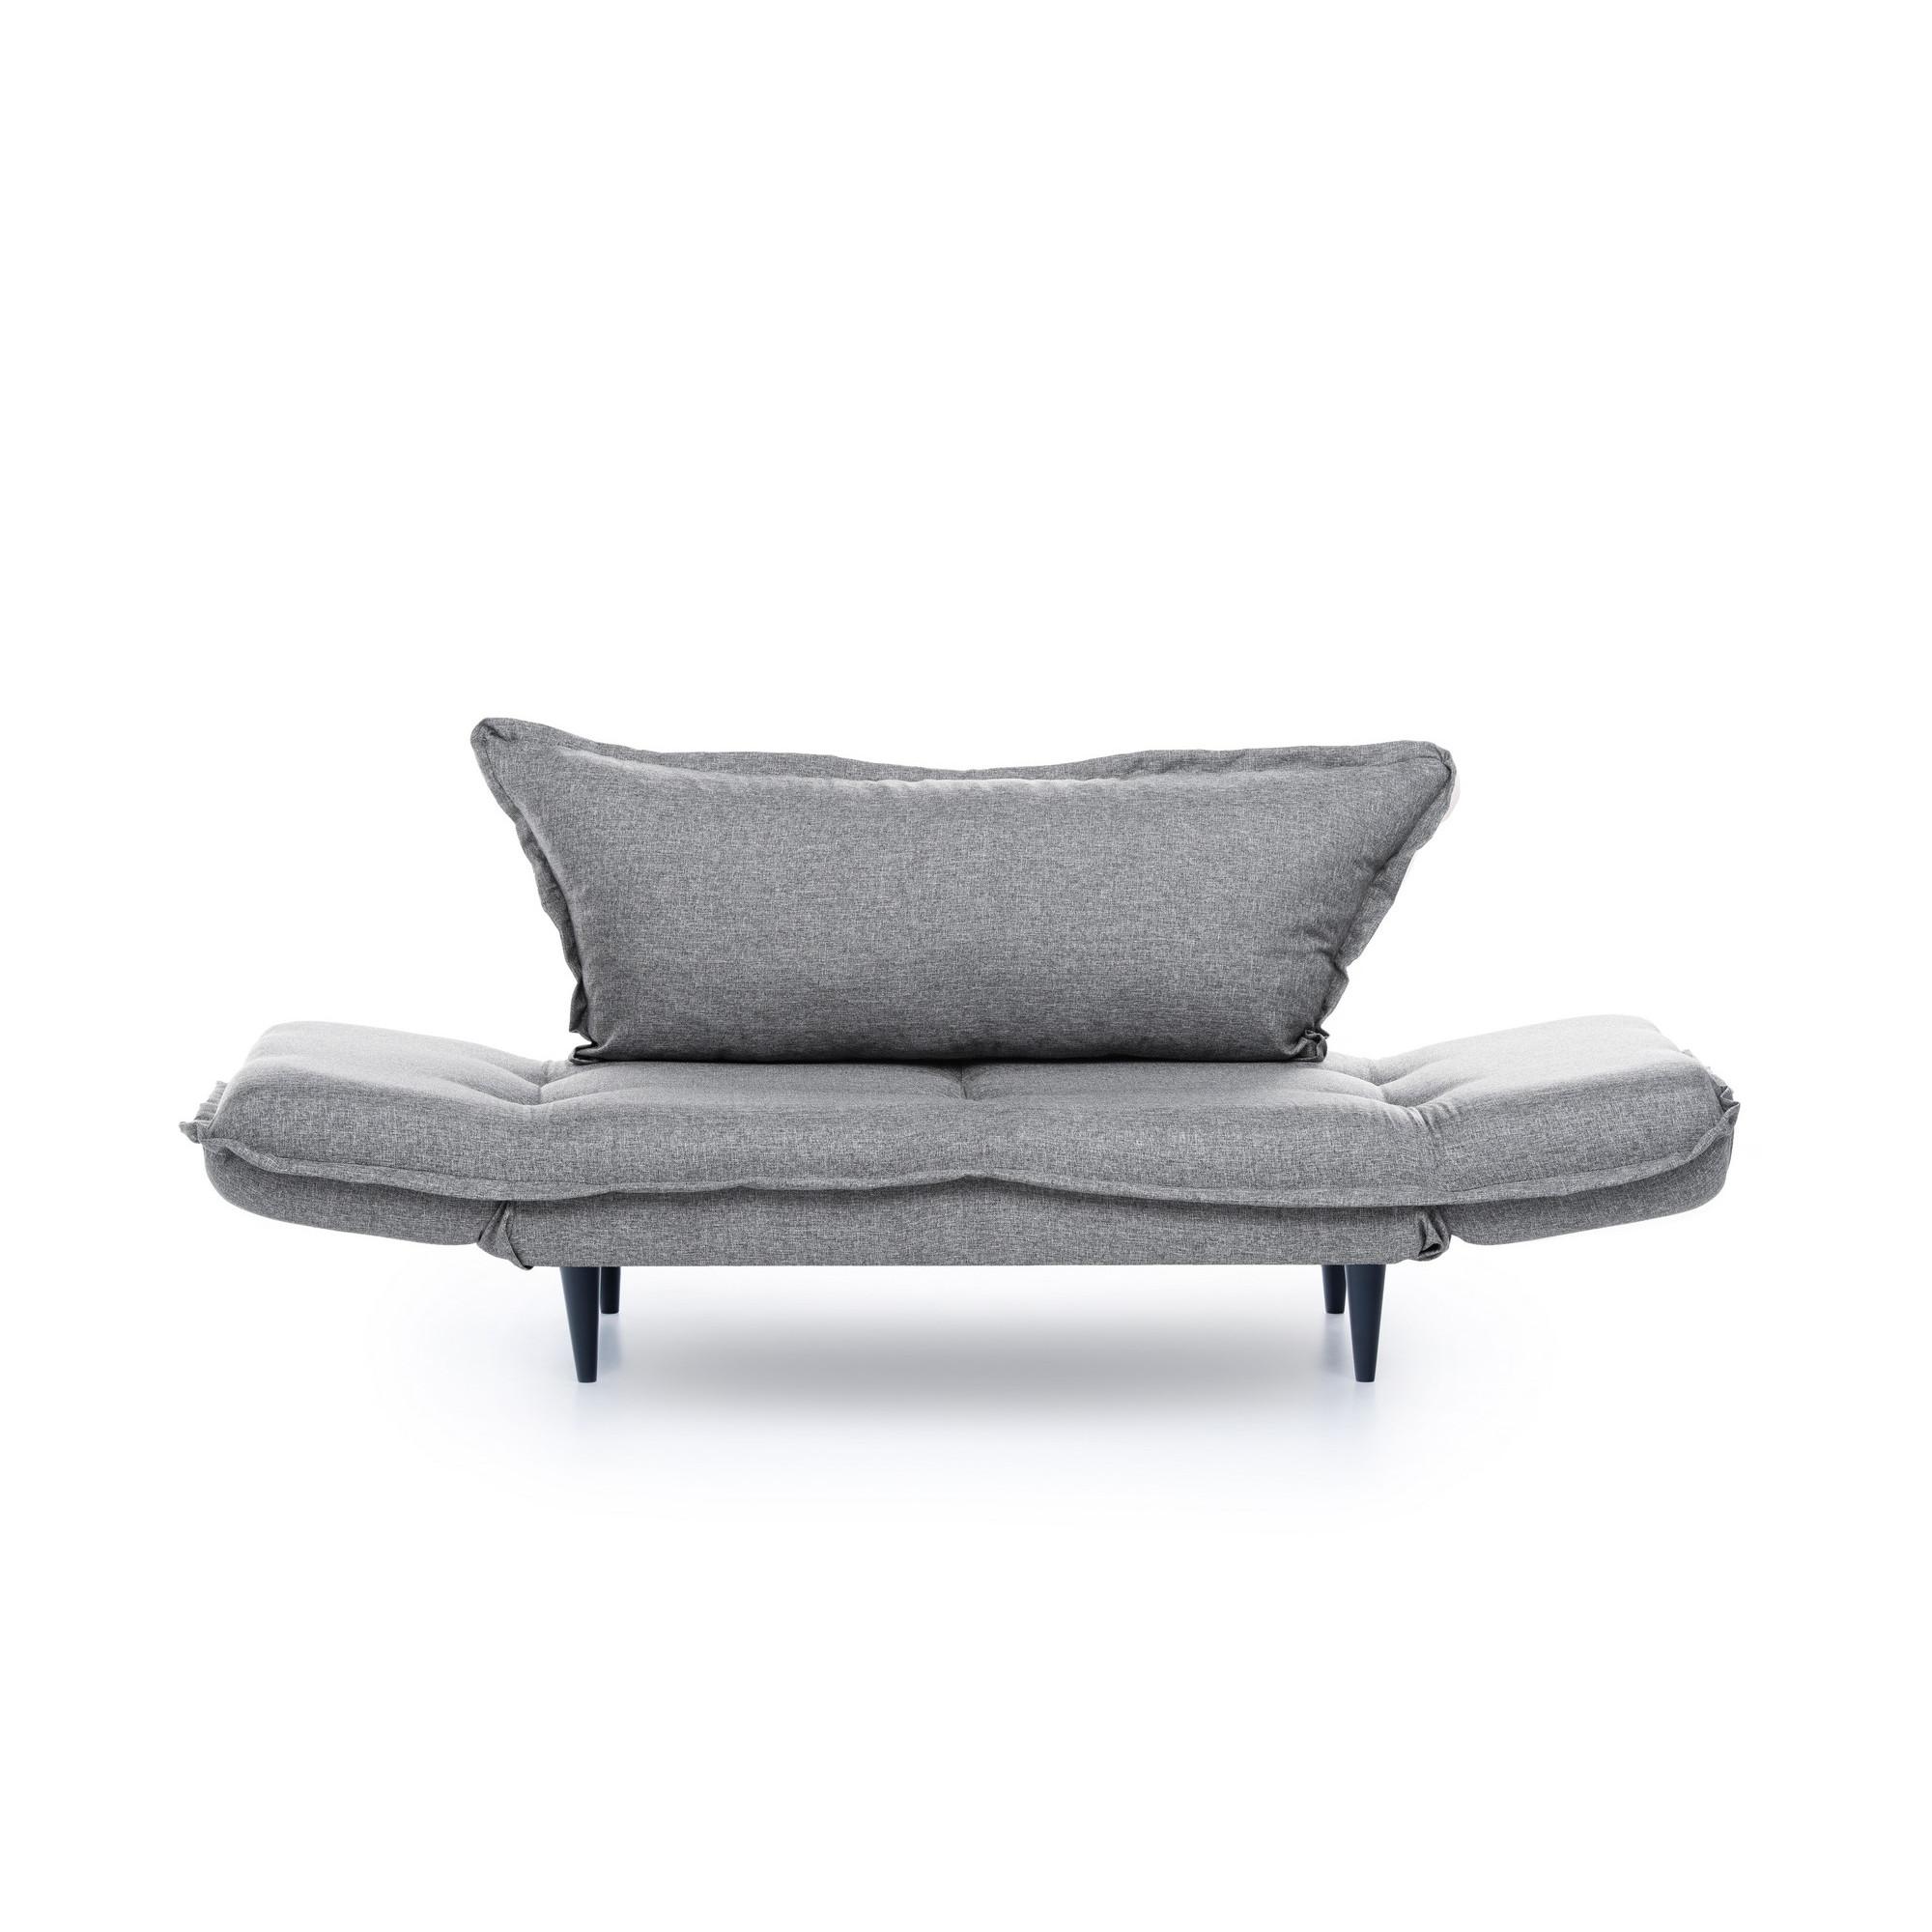 3 Seater Sofa Bed Vino | Grey